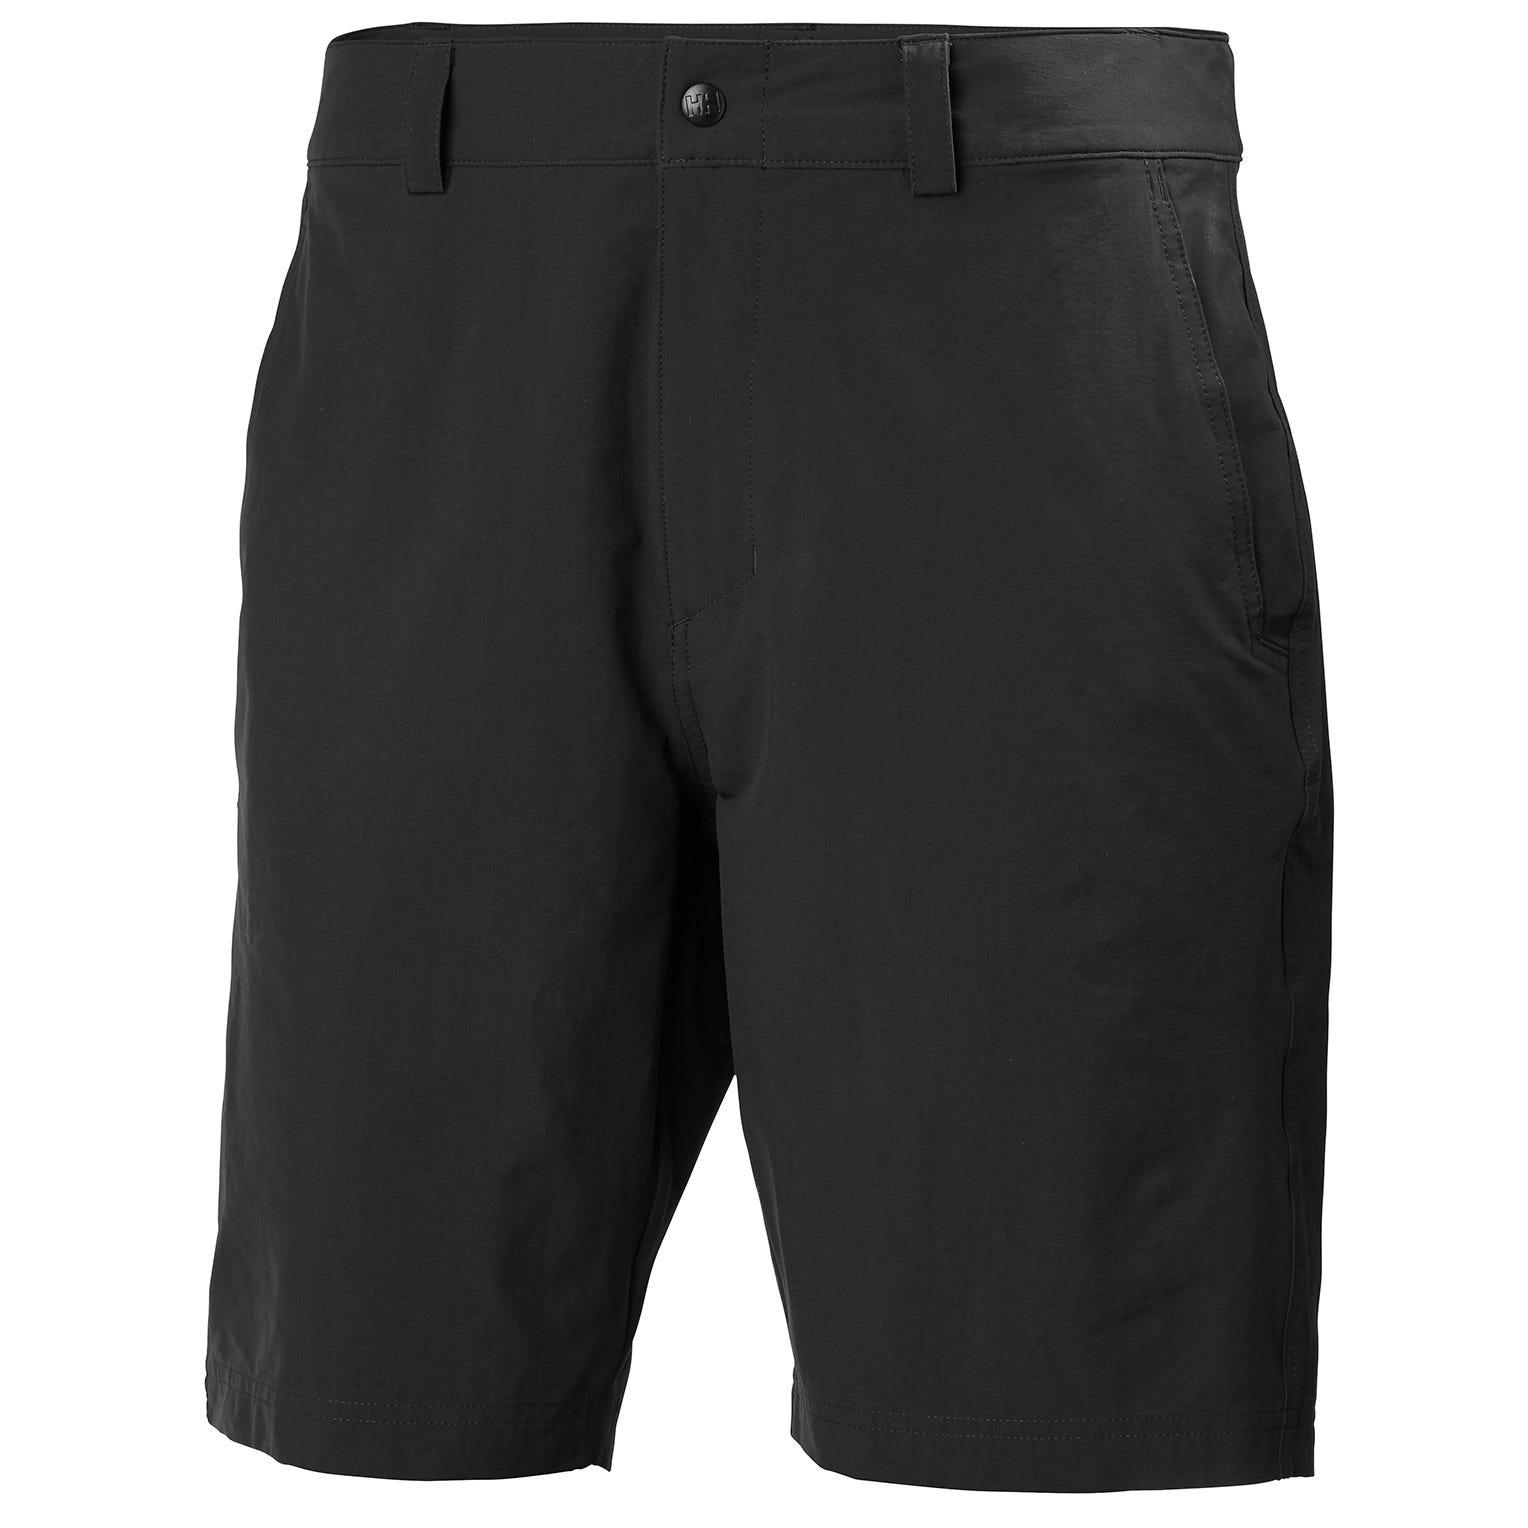 "Helly Hansen Hp Qd Club Shorts 10"" Mens Sailing Pant Black 38"